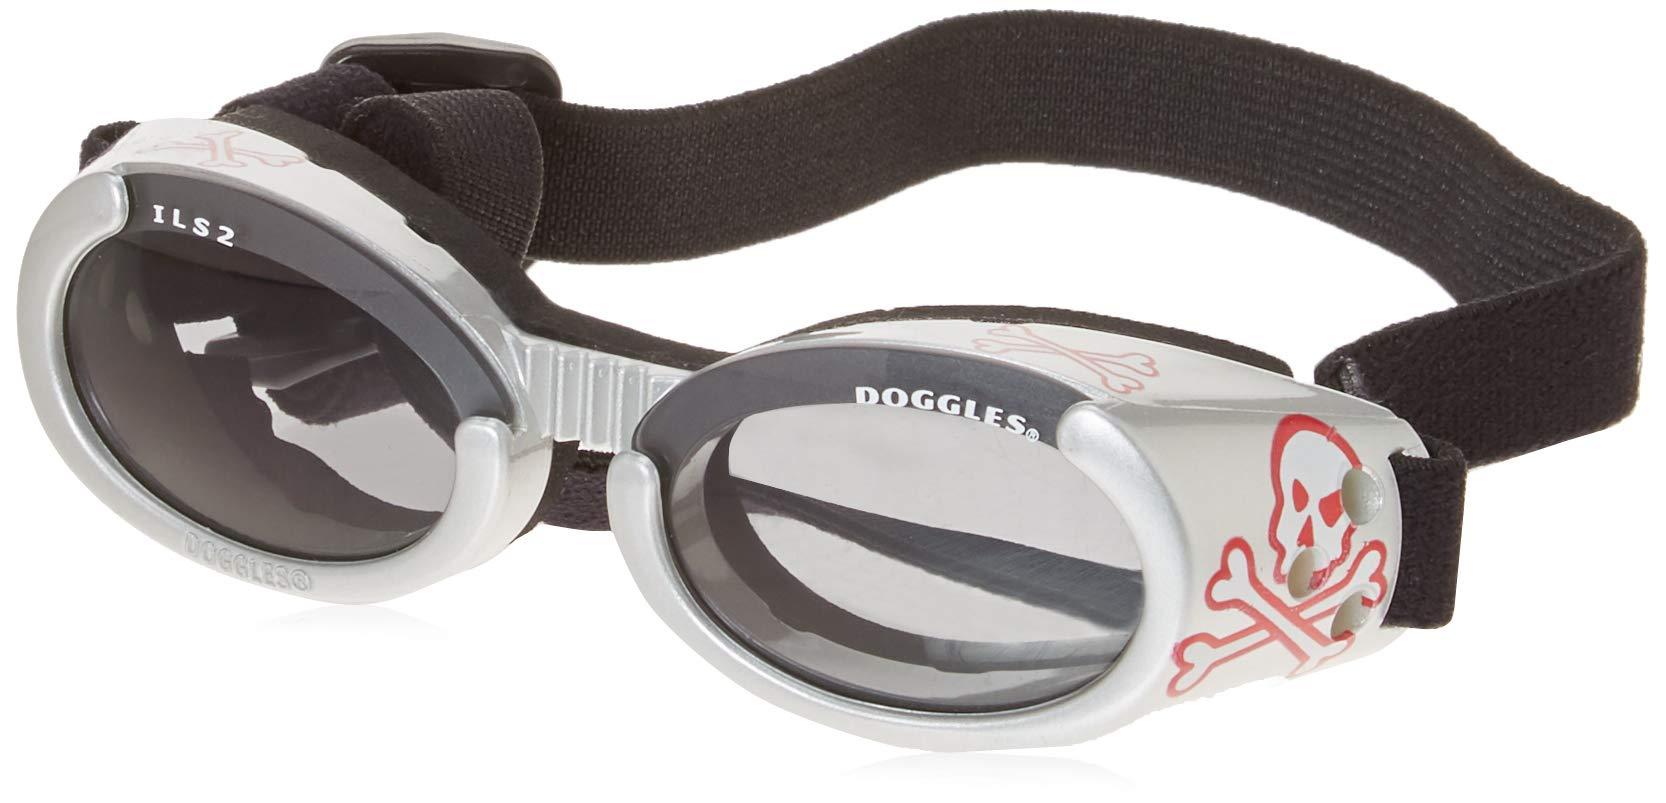 Doggles - ILS Small Silver Skull Frame / Smoke Lens (DODGILSM-14) -